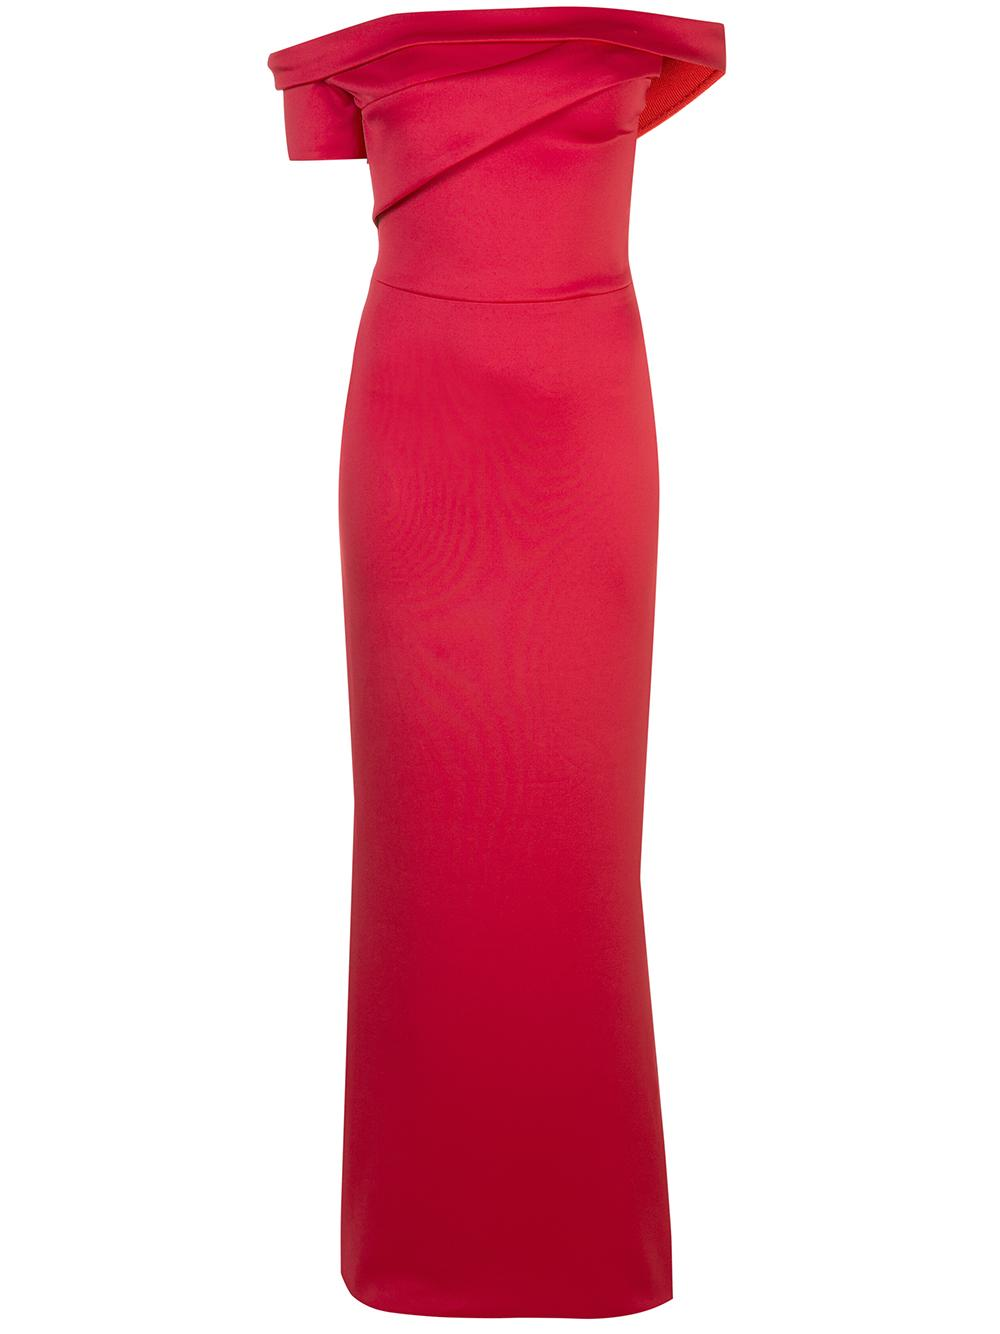 Zendaya Neoprene Gown